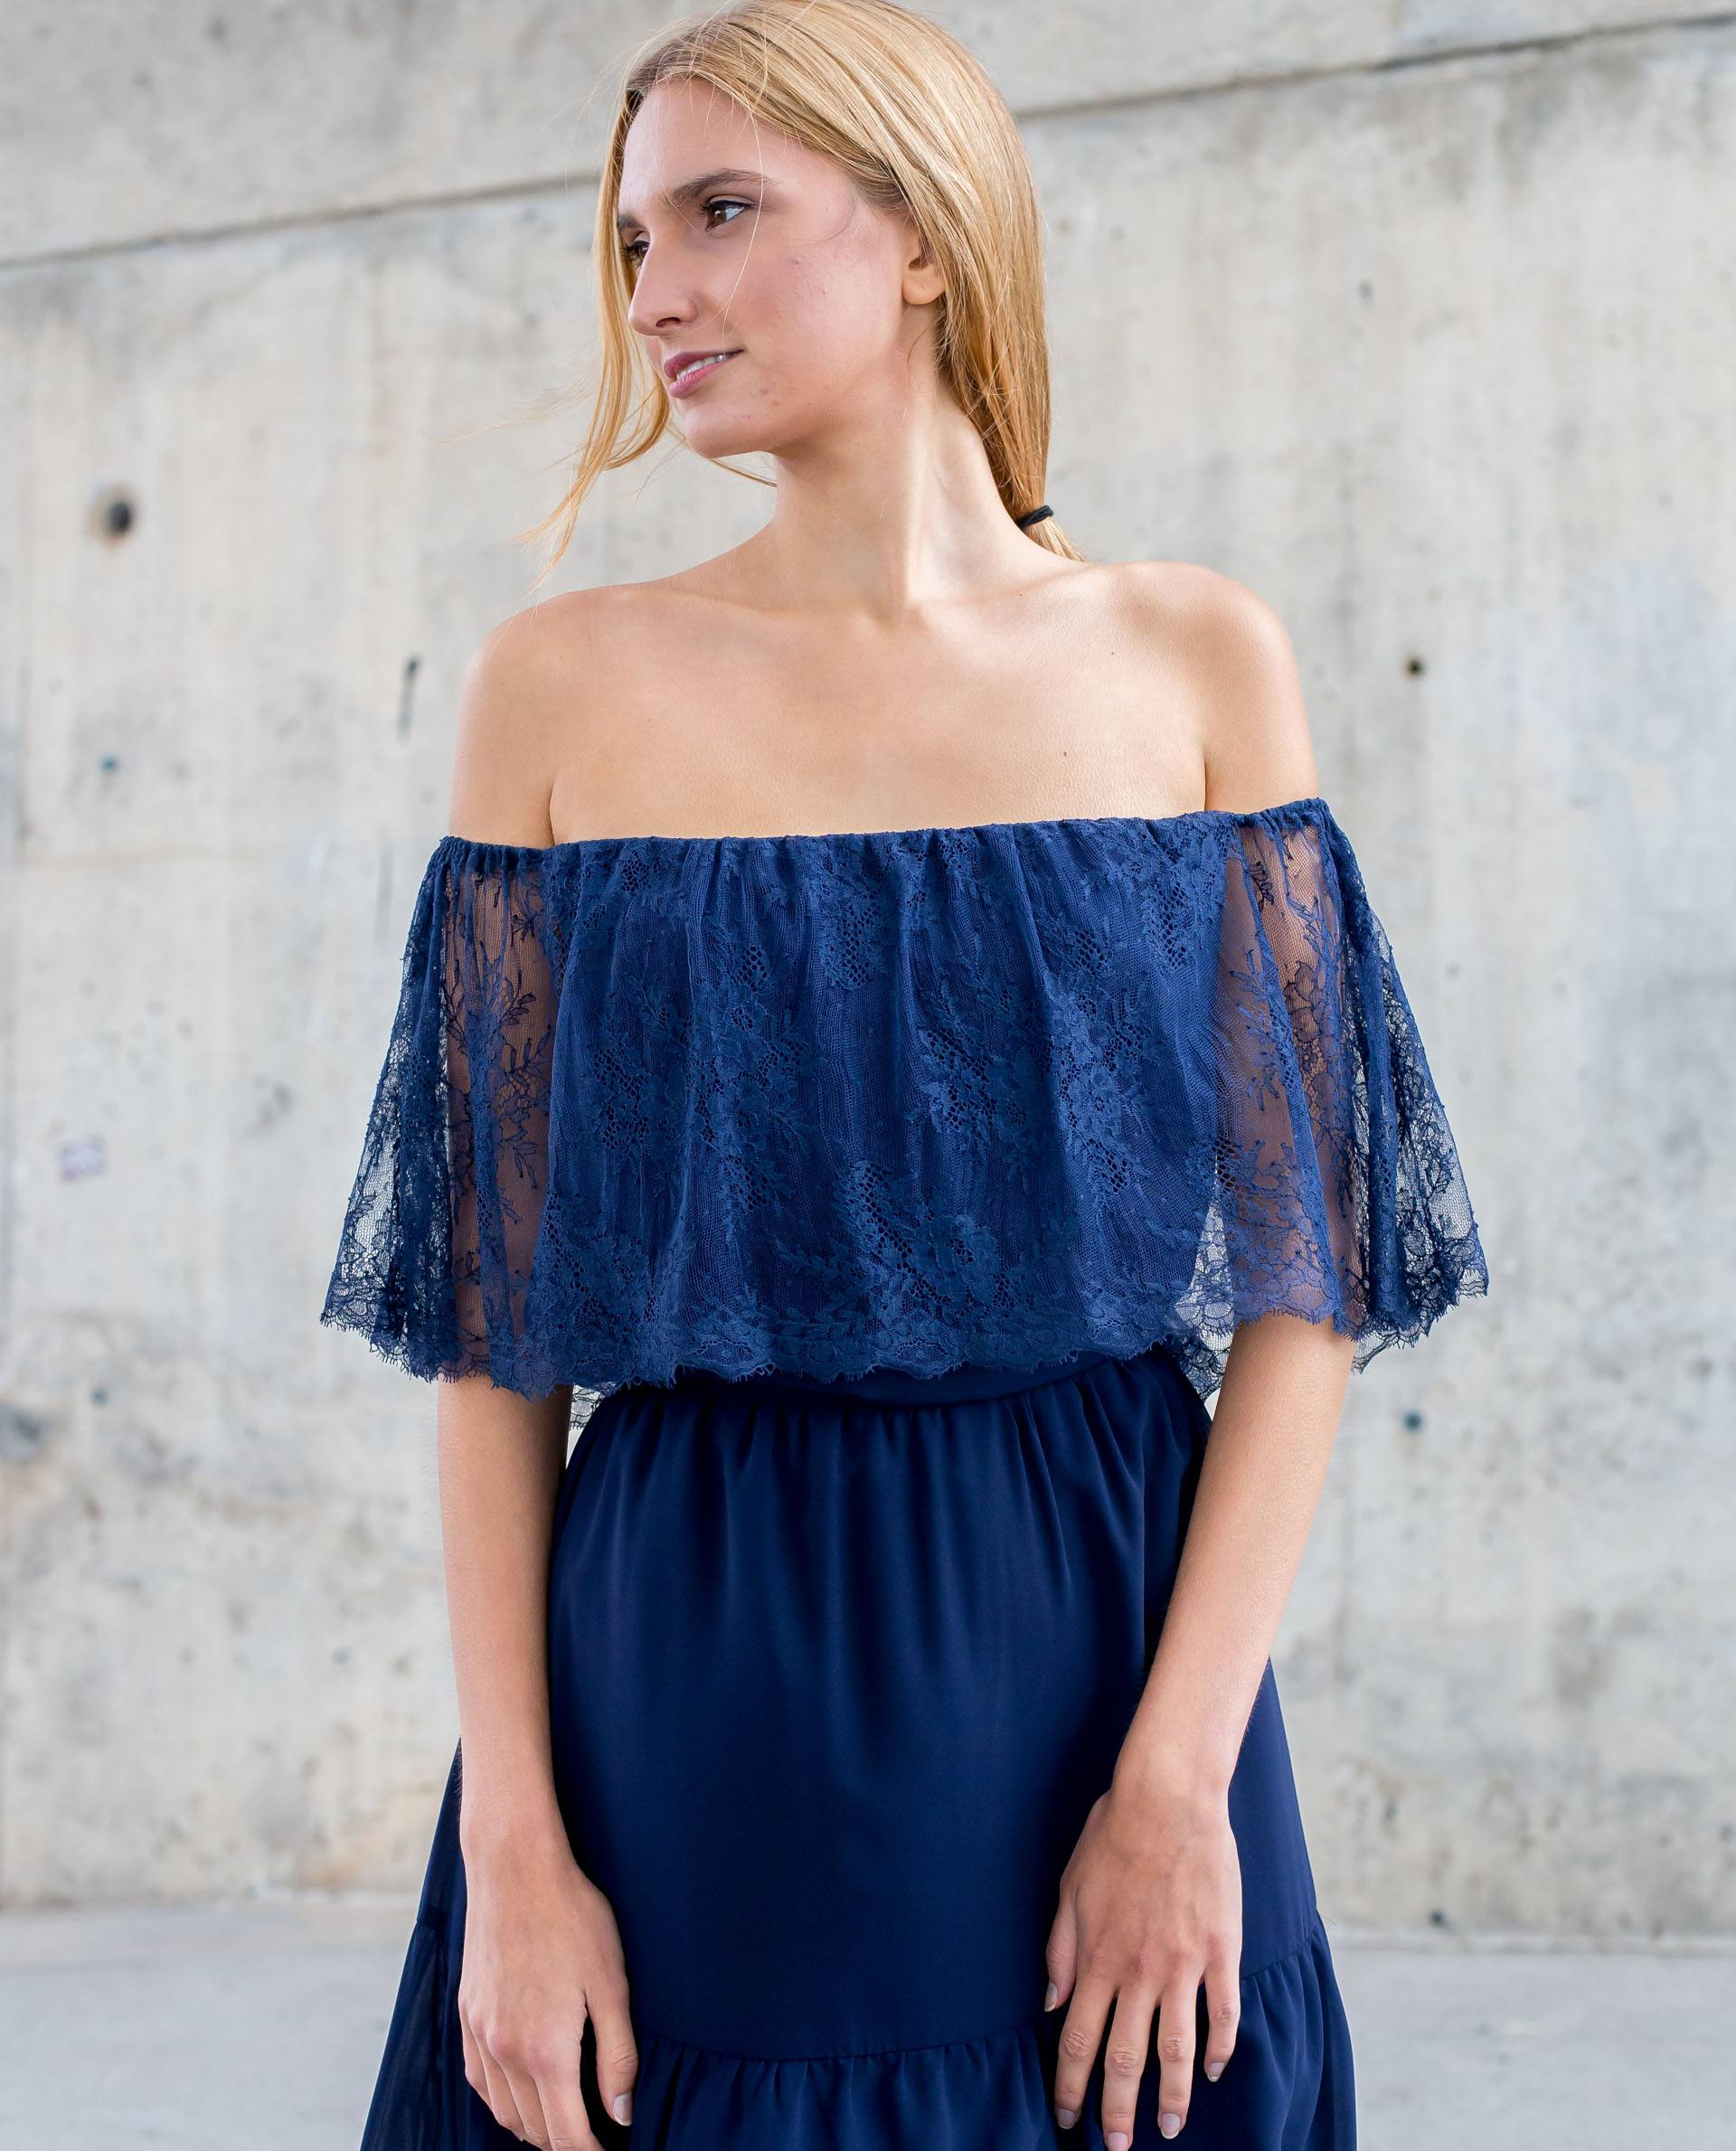 PRÊT À PORTER-SPRING/SUMMER 2018 - TOPS - Top azul marino hombros caidos